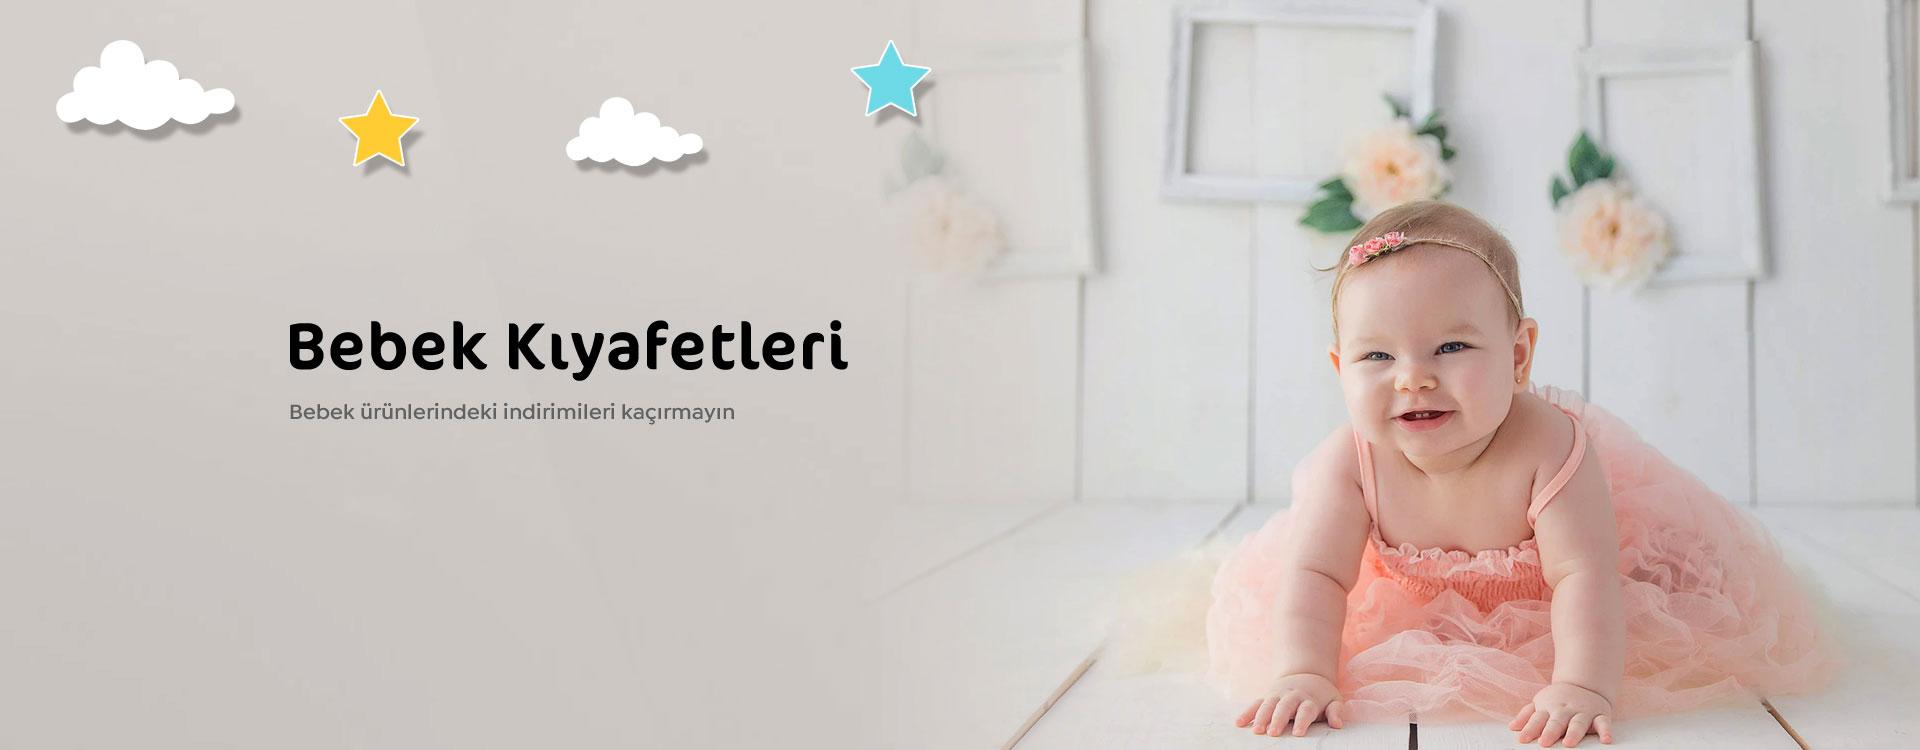 kozaavm.com fatazi giyim